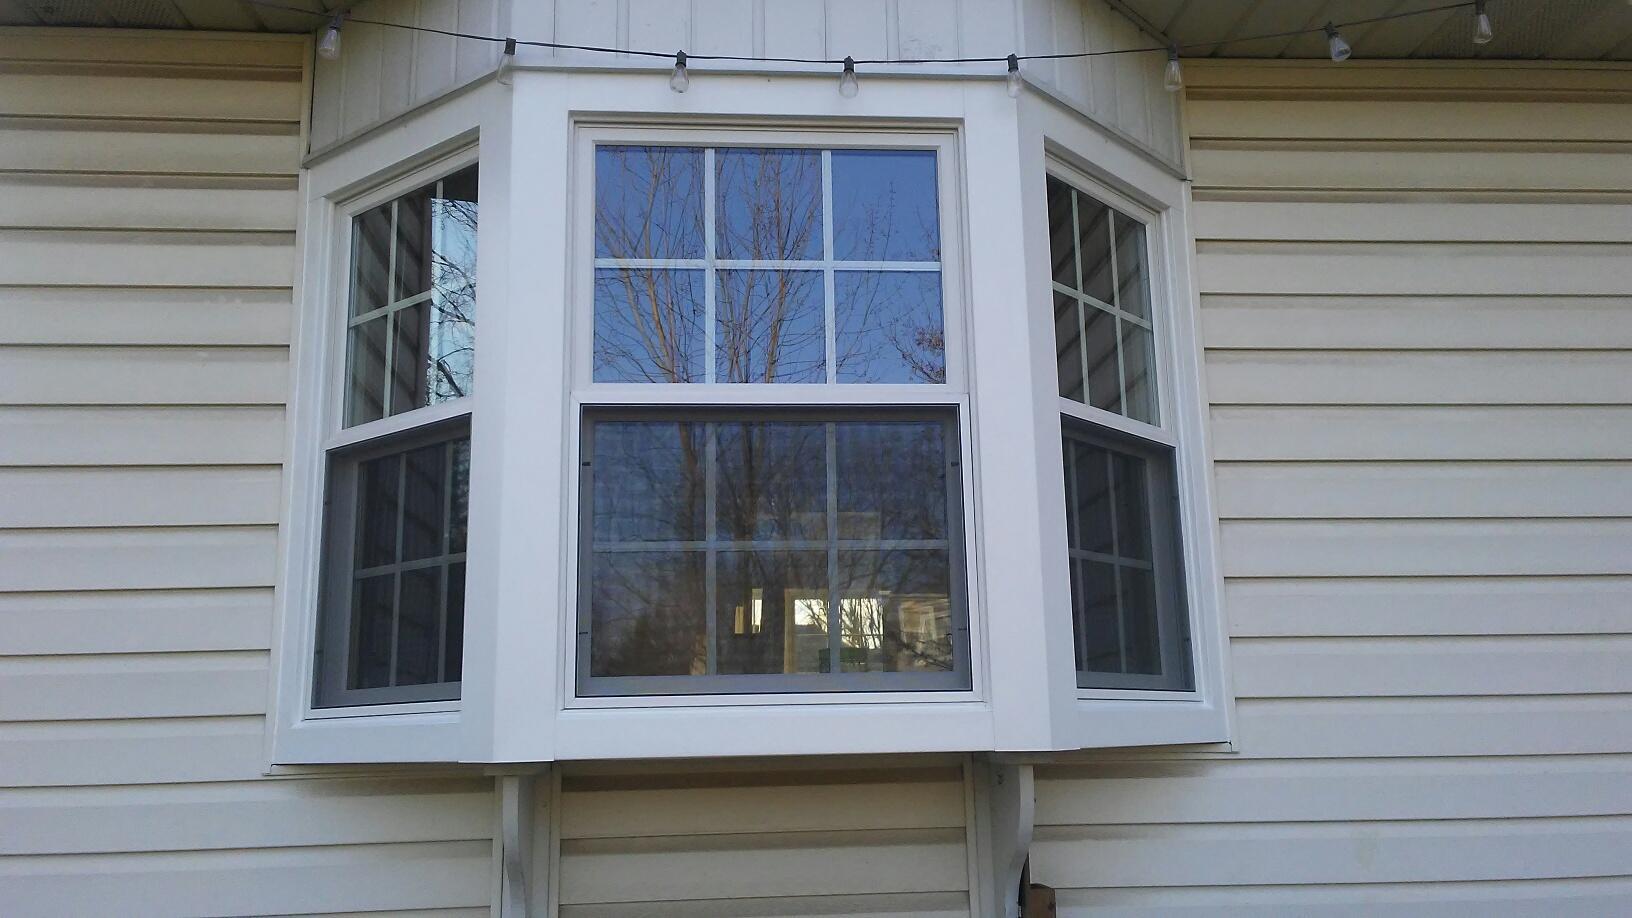 Marvin Infinity Fiberglass Bay Window Install in PA